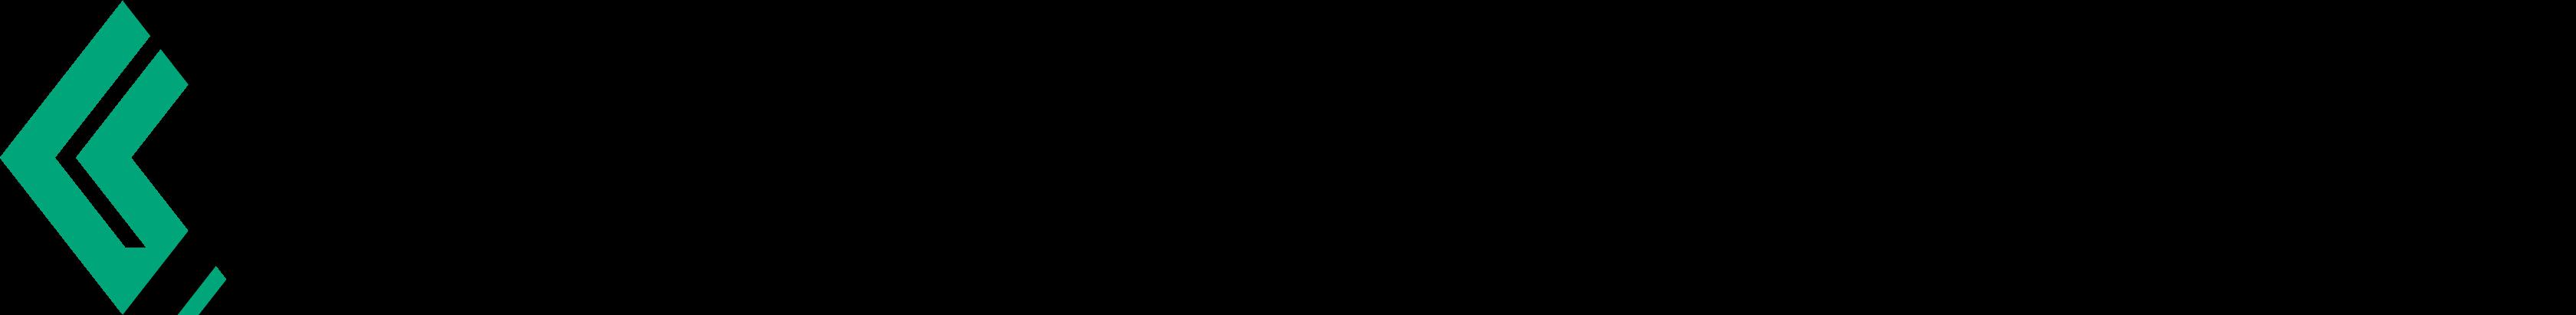 Partner 3 Logo